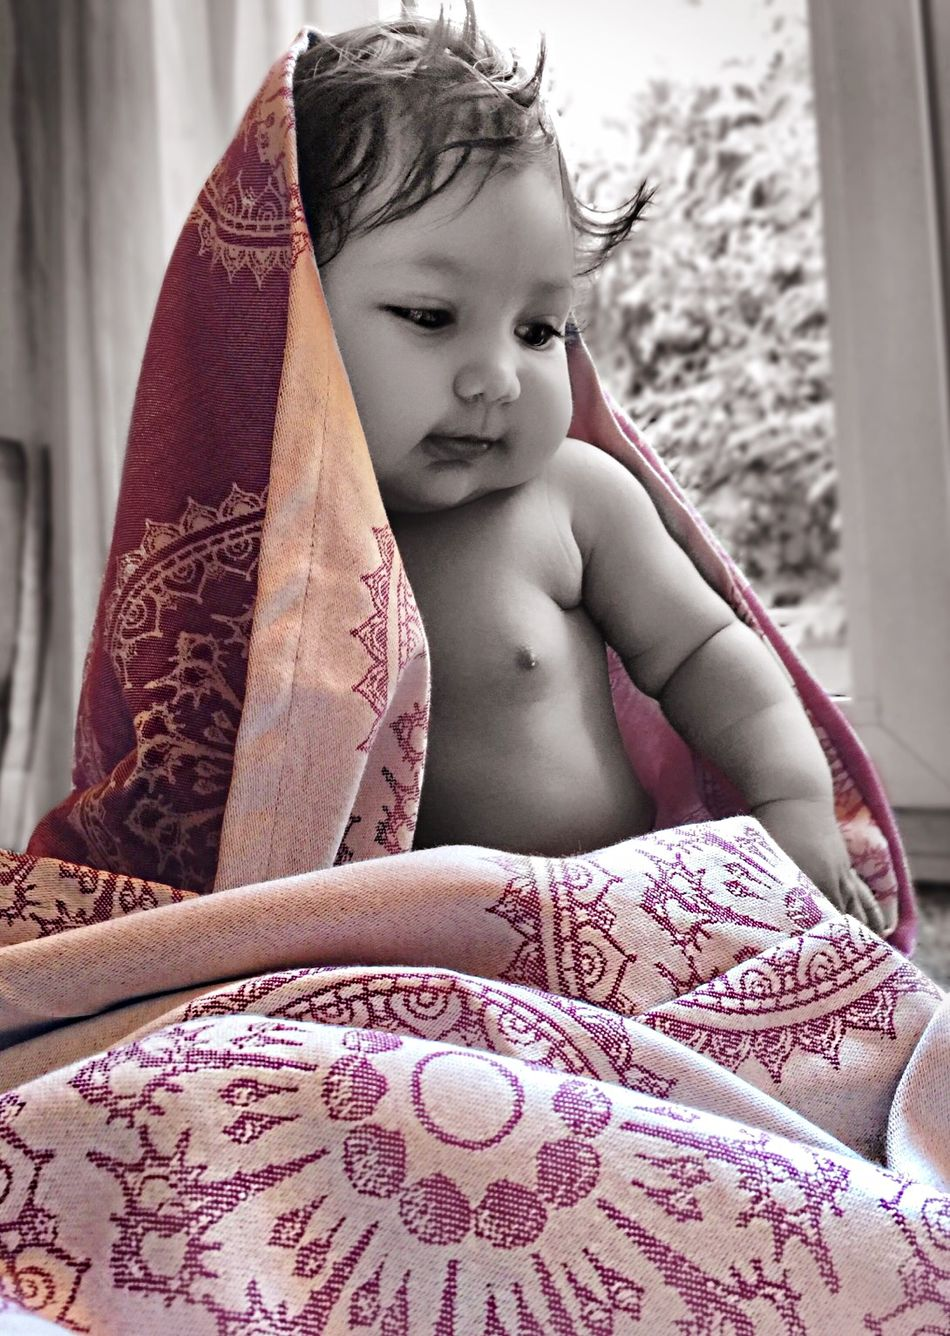 Babywearing Baby Babygirl My Baby Ring Sling Lenny Lamb Blackandwhite IPhoneography Iphone 6 Plus